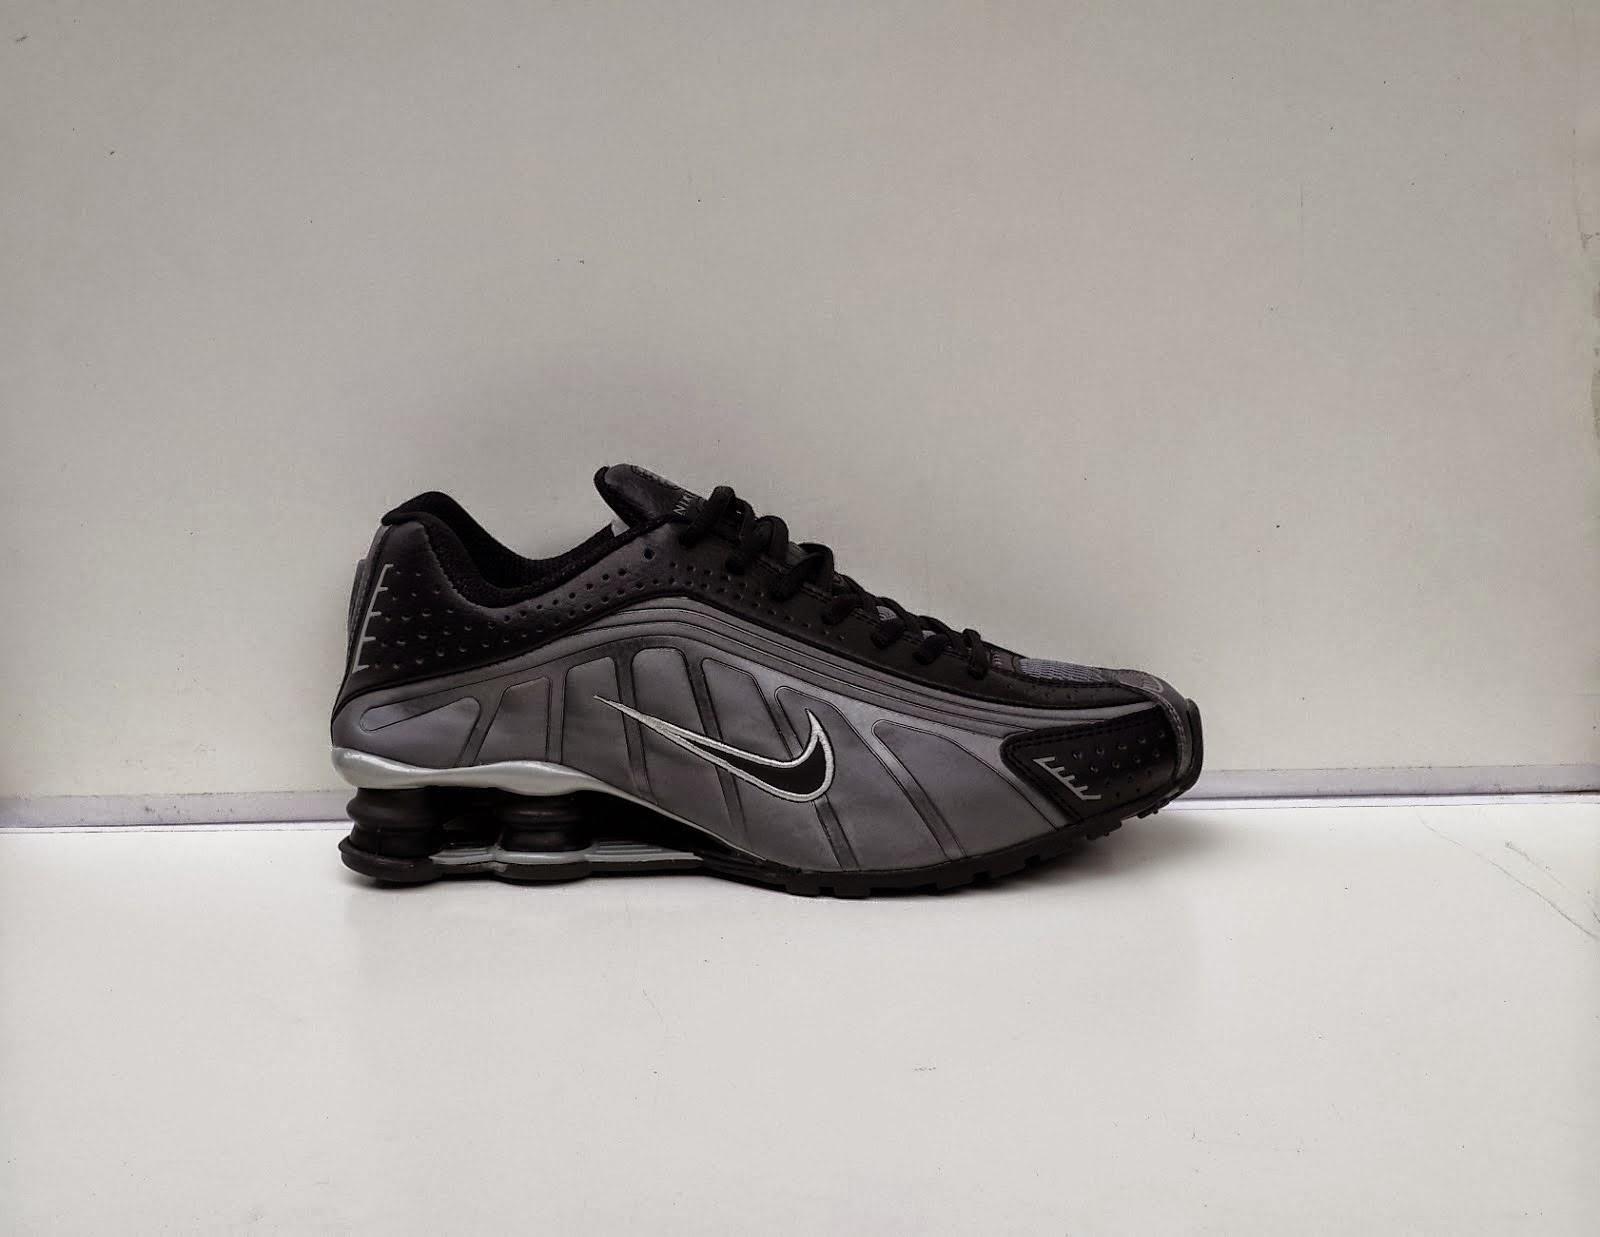 Jual sepatu  Nike Shox R4, sepatu  Nike Shox R4, Sepatu  Nike Shox R4 terbaru, Sepatu  Nike Shox R4 terbaru 2014, Grosir  Nike Shox R4